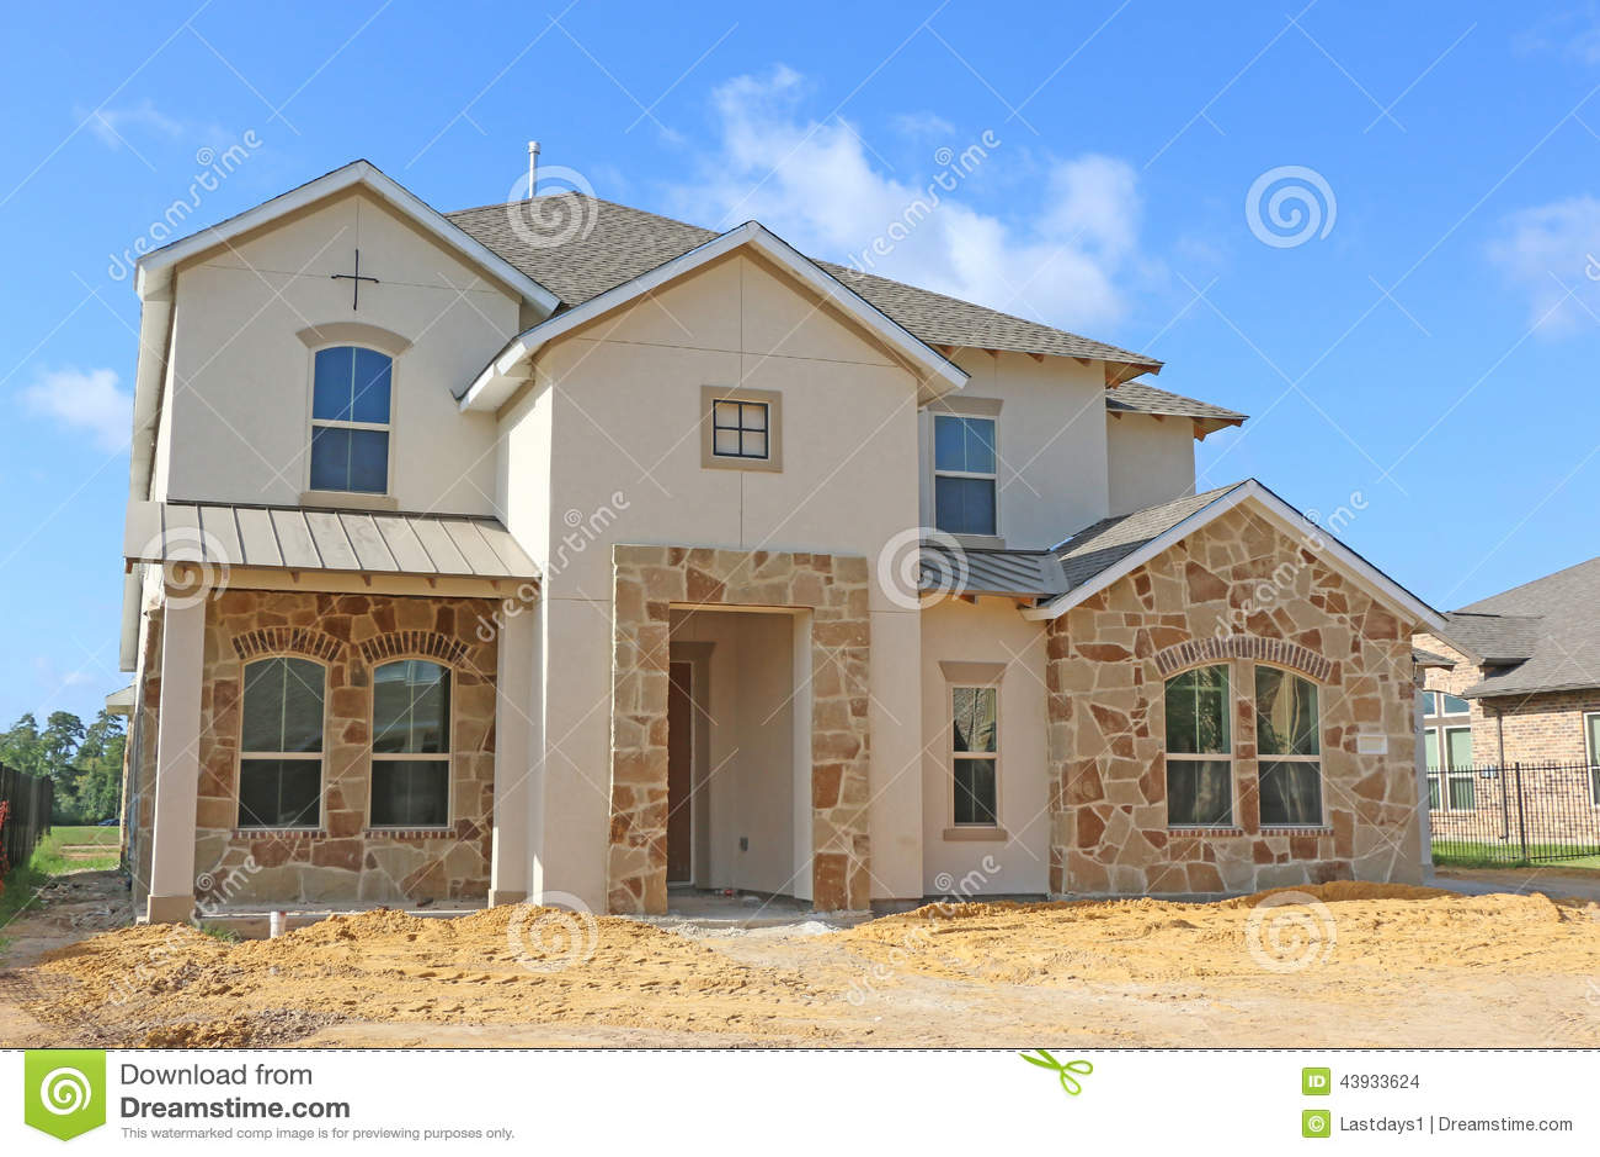 Schöne Häuser Stockfoto - Bild: 43933624 size: 1300 x 957 post ID: 4 File size: 0 B